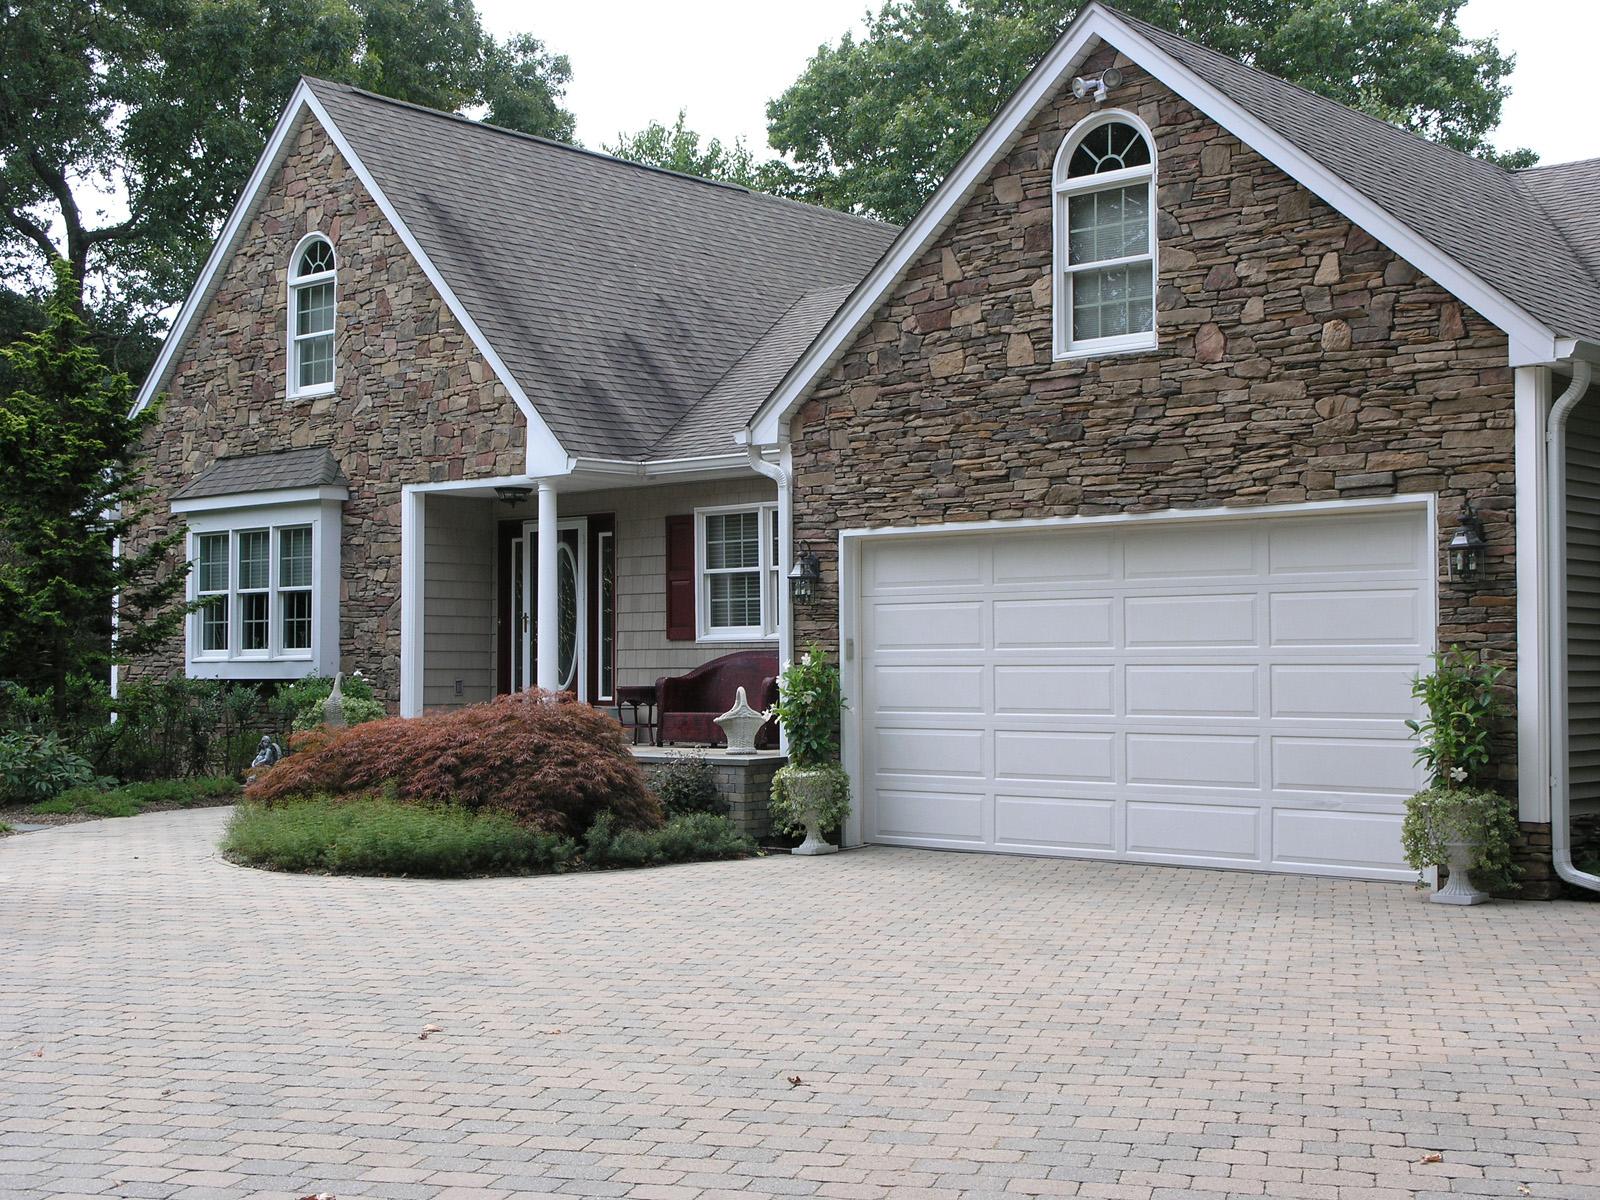 Professional landscape paver design company in Long Island, NY